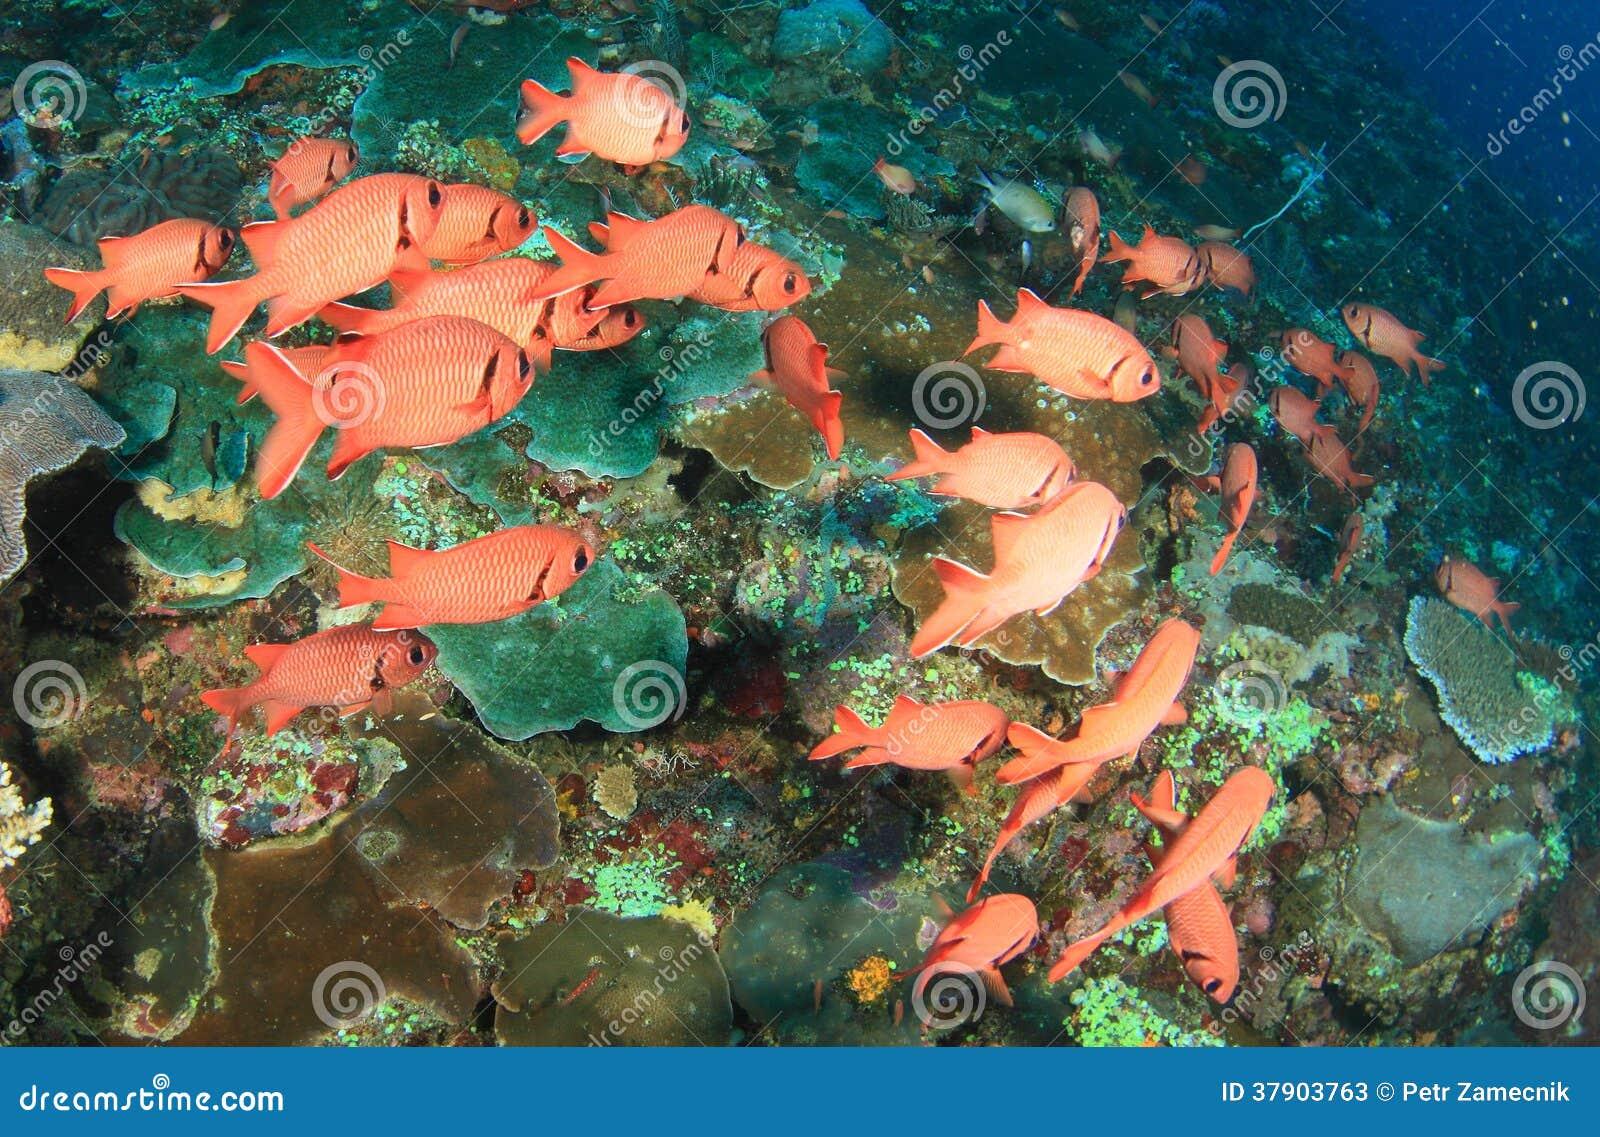 School of red fish